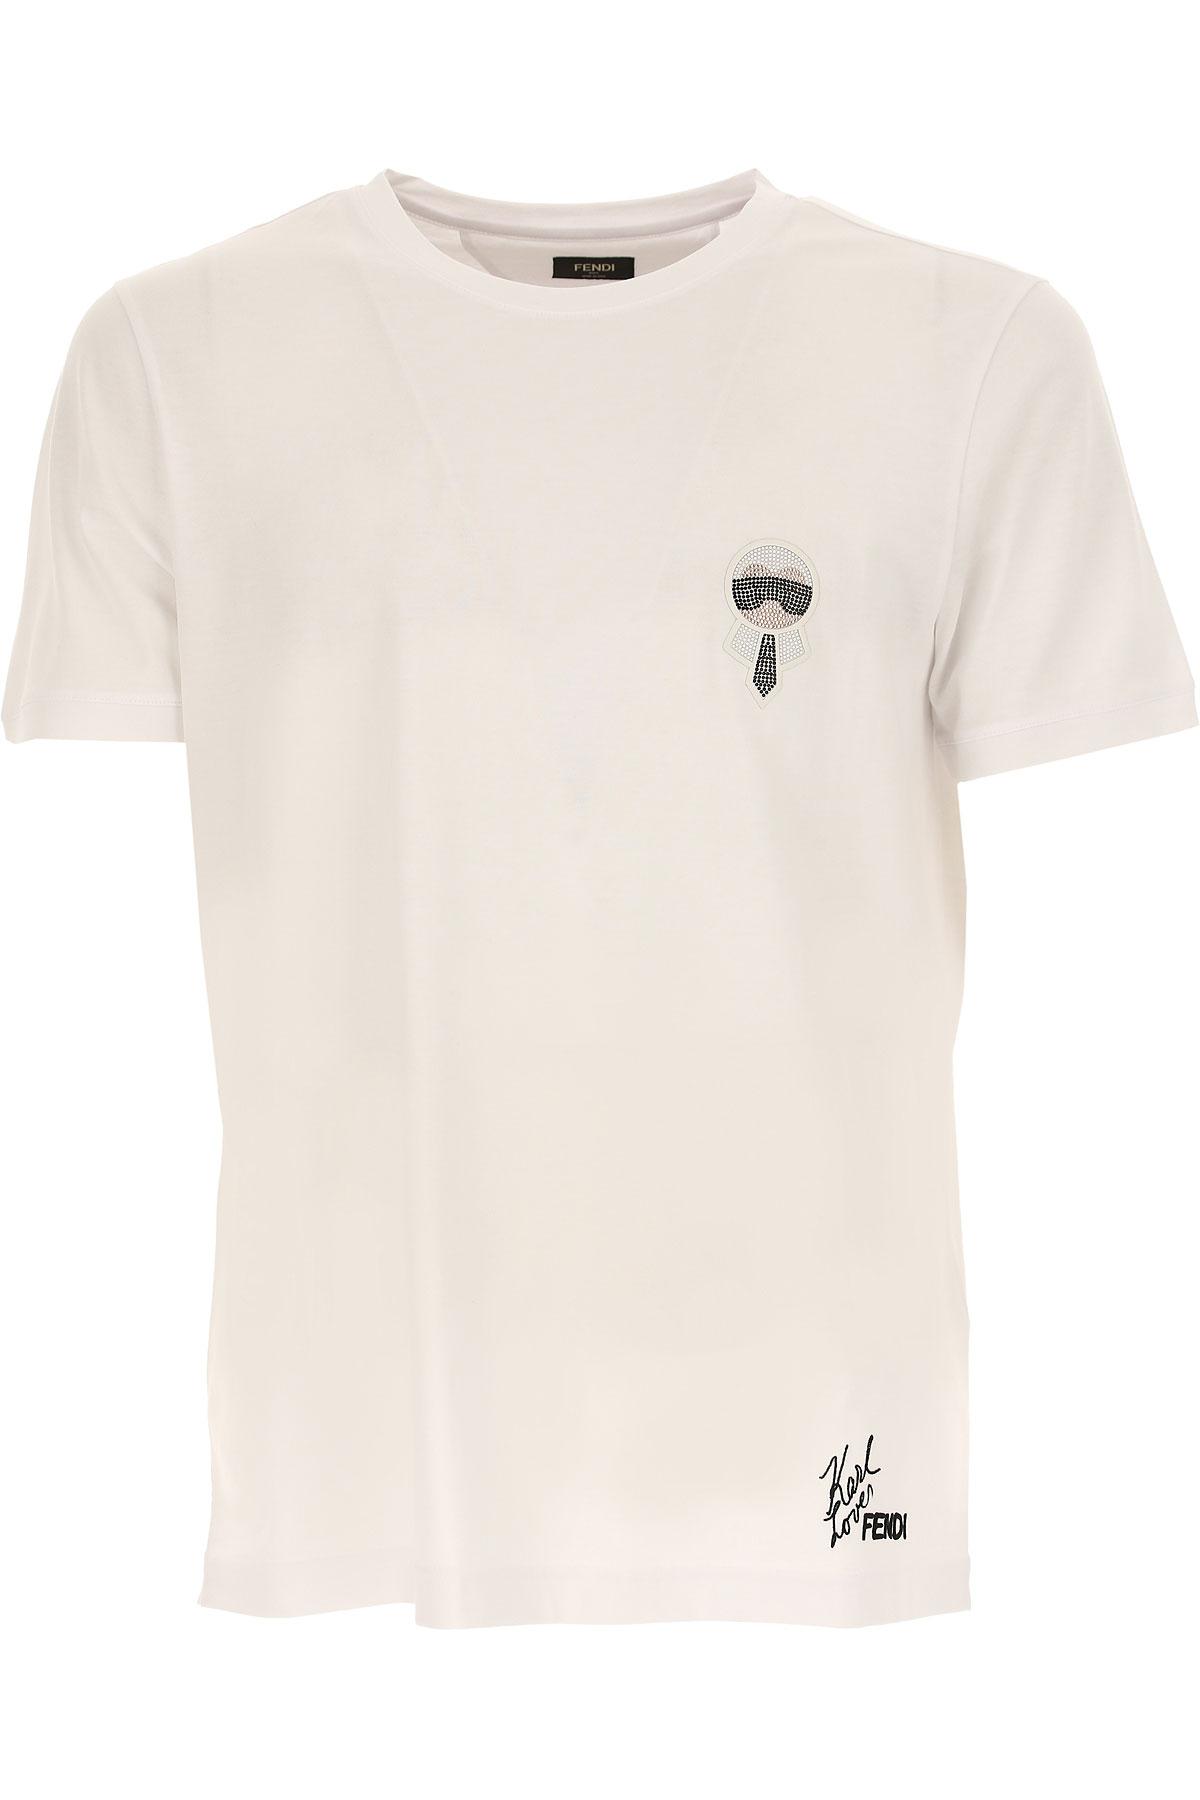 Fendi T-shirt Homme, Karl Lagerfeld, Blanc, Coton, 2017, L M S XL